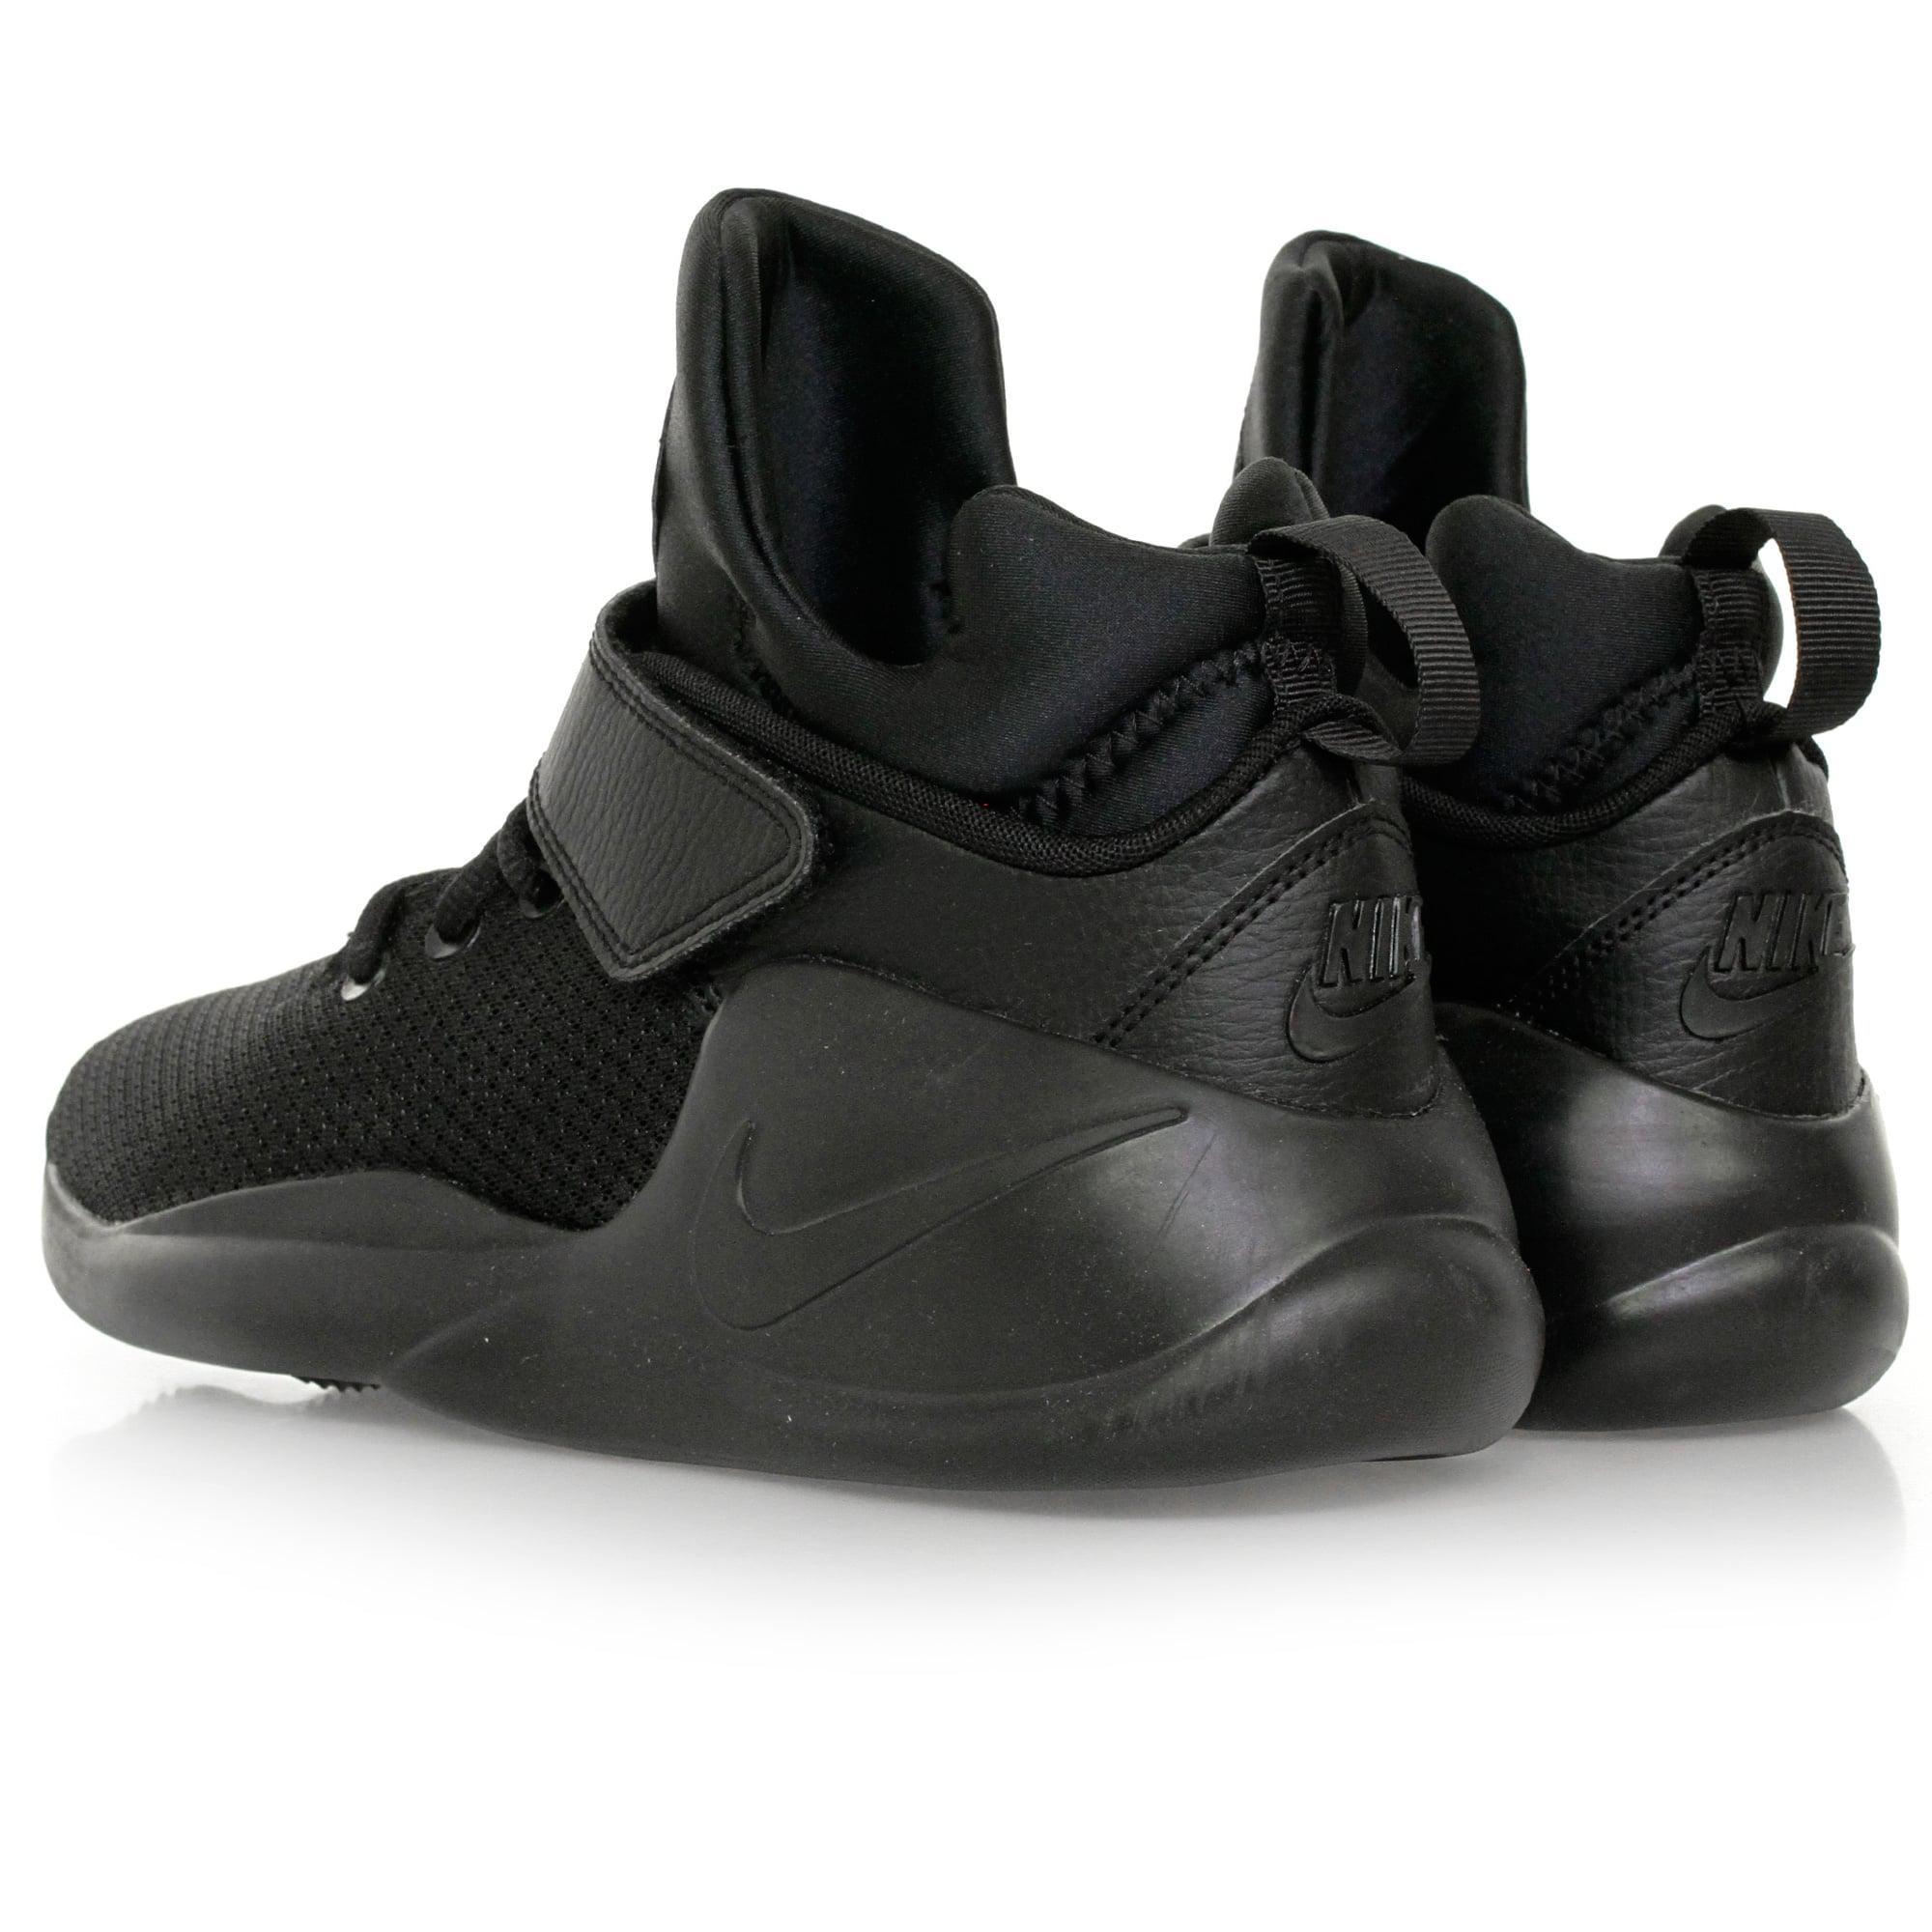 c07bffb5bcce ... promo code for lyst nike kwazi black shoe 844839 001 in black for men  415f3 7c604